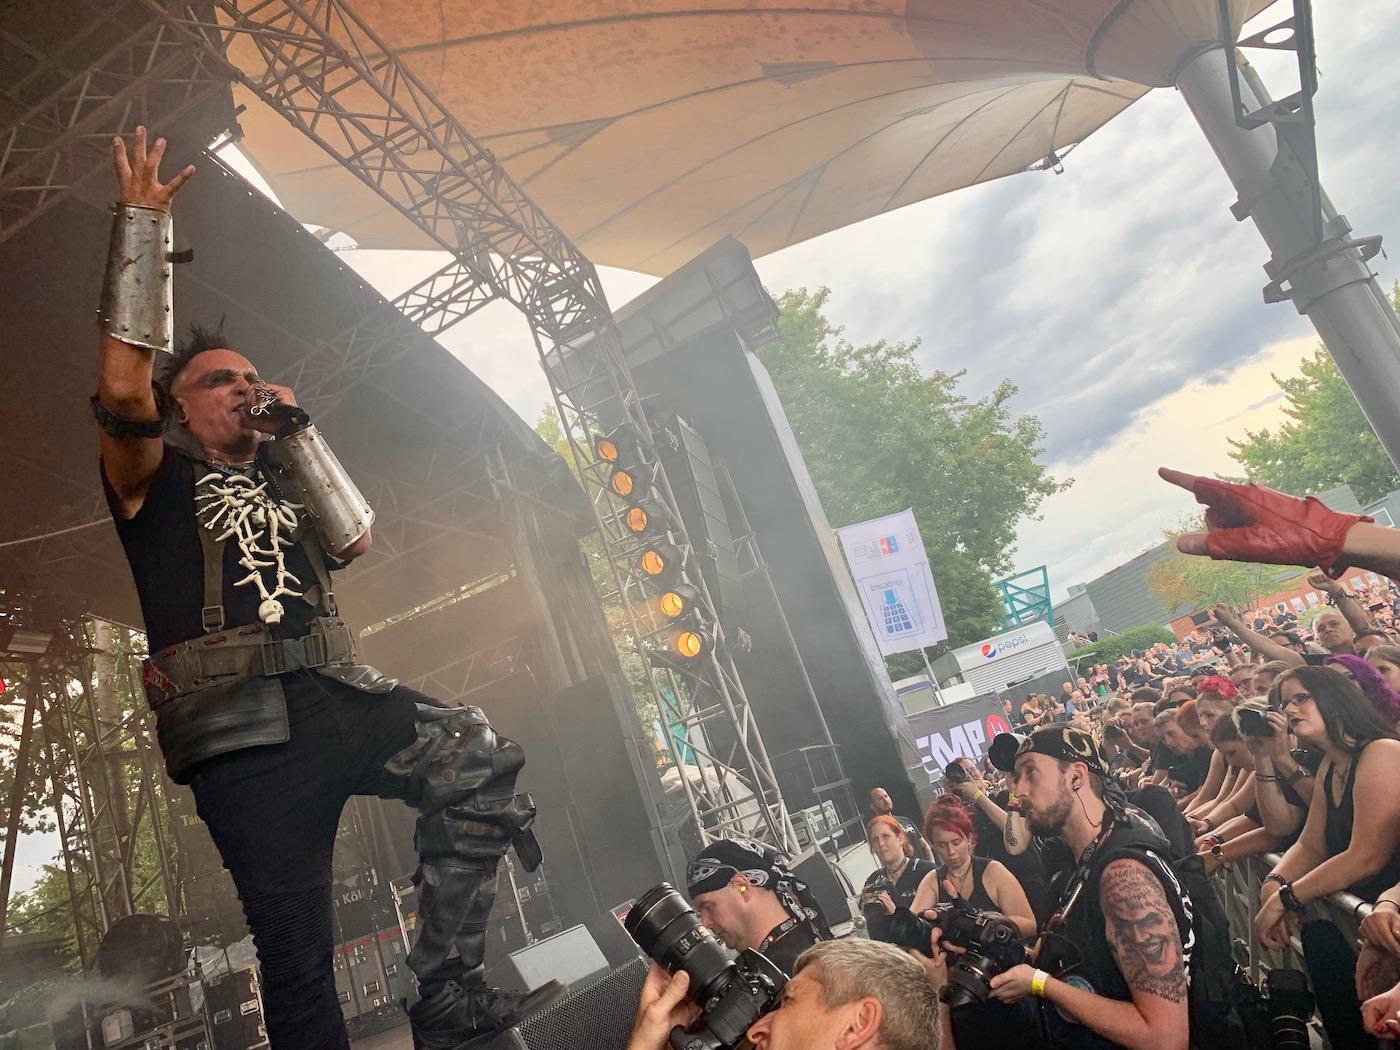 mark_benecke_amphi_festival_koeln_2019 - 53.jpg